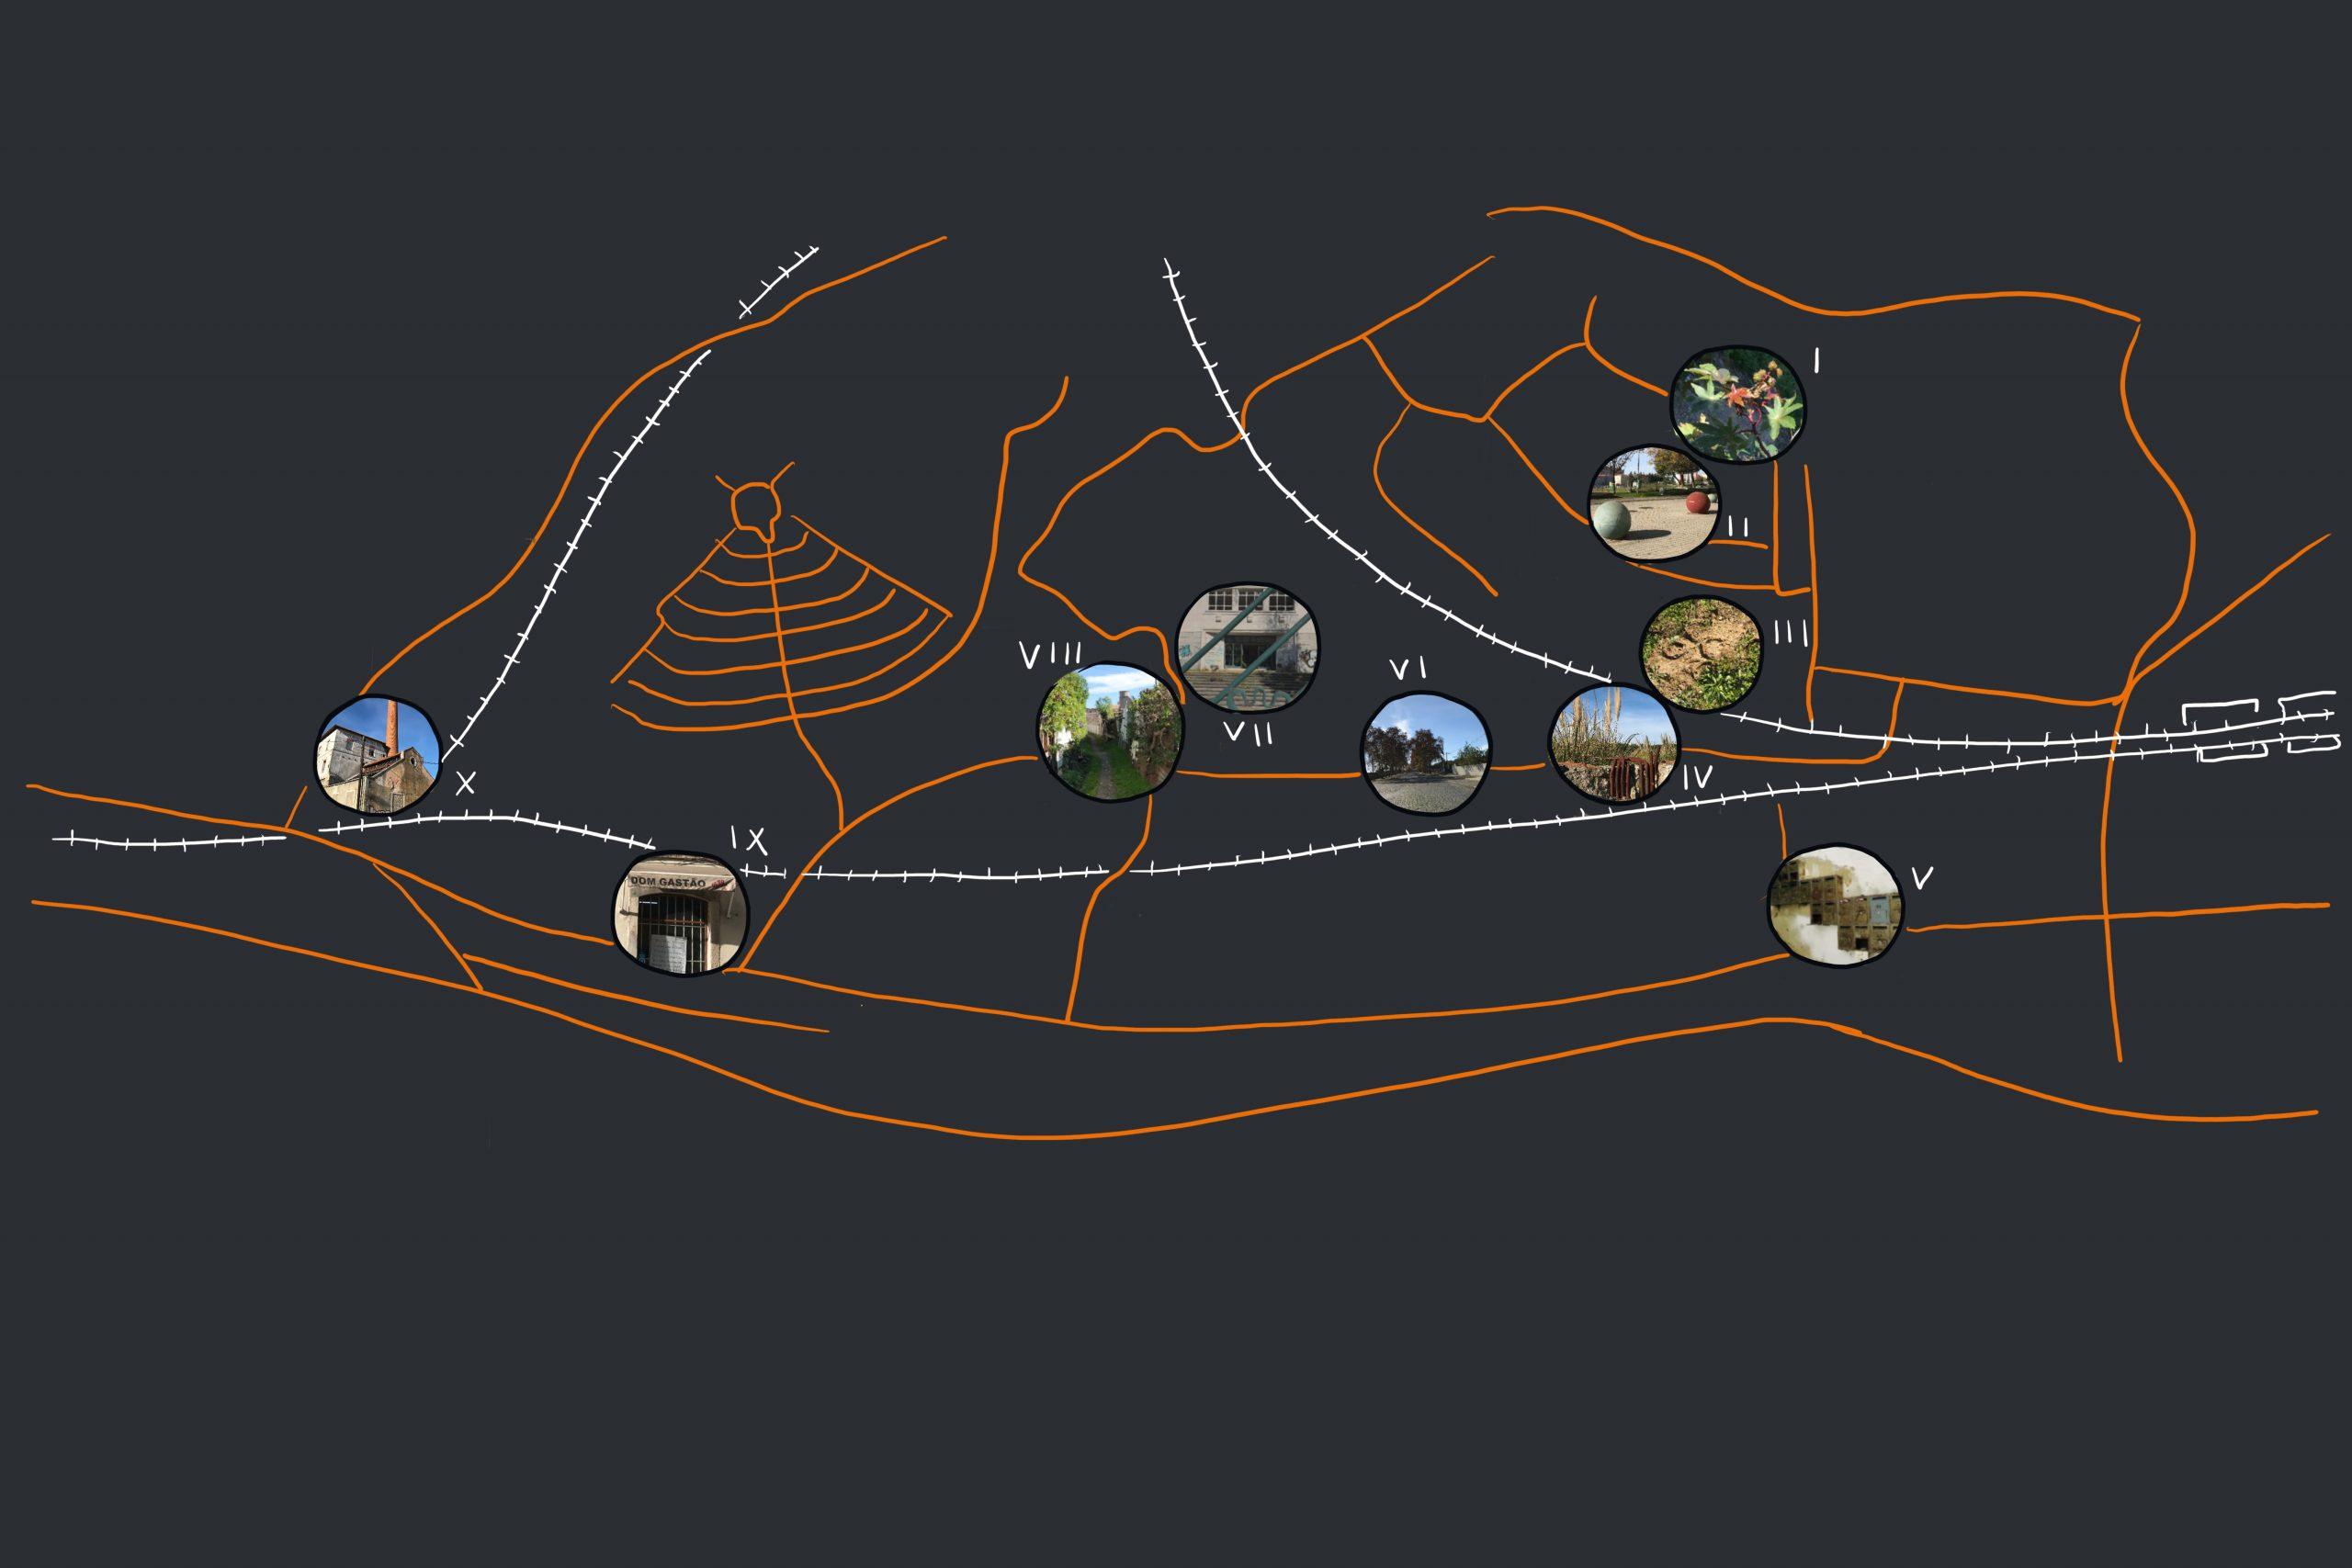 Mapa dos vazios